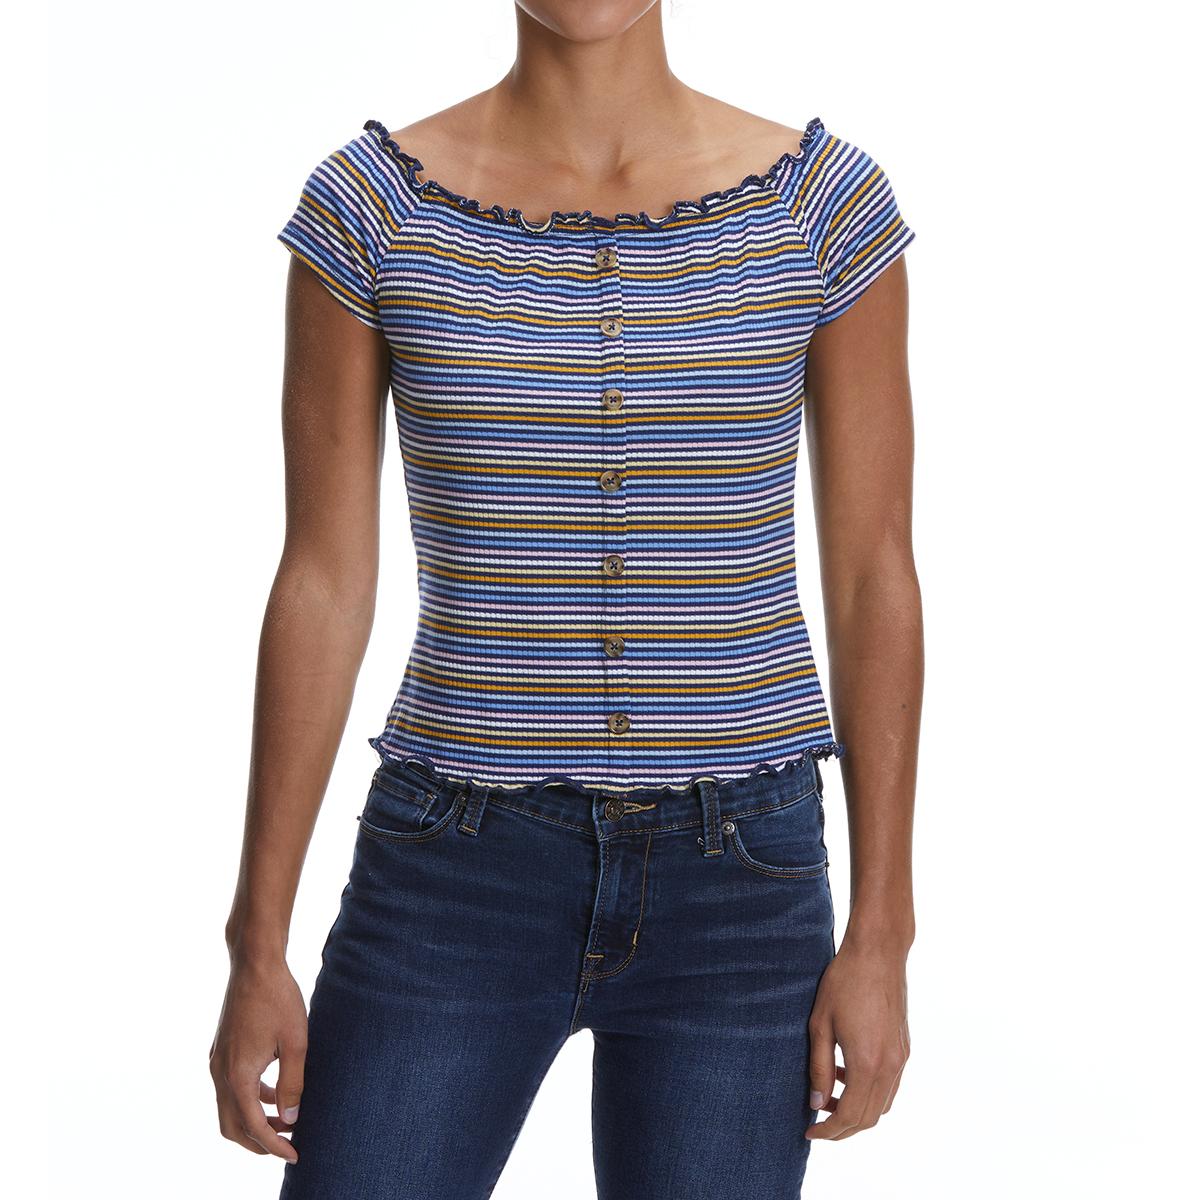 No Comment Juniors' Off-The-Shoulder Short-Sleeve Shirt - Blue, L